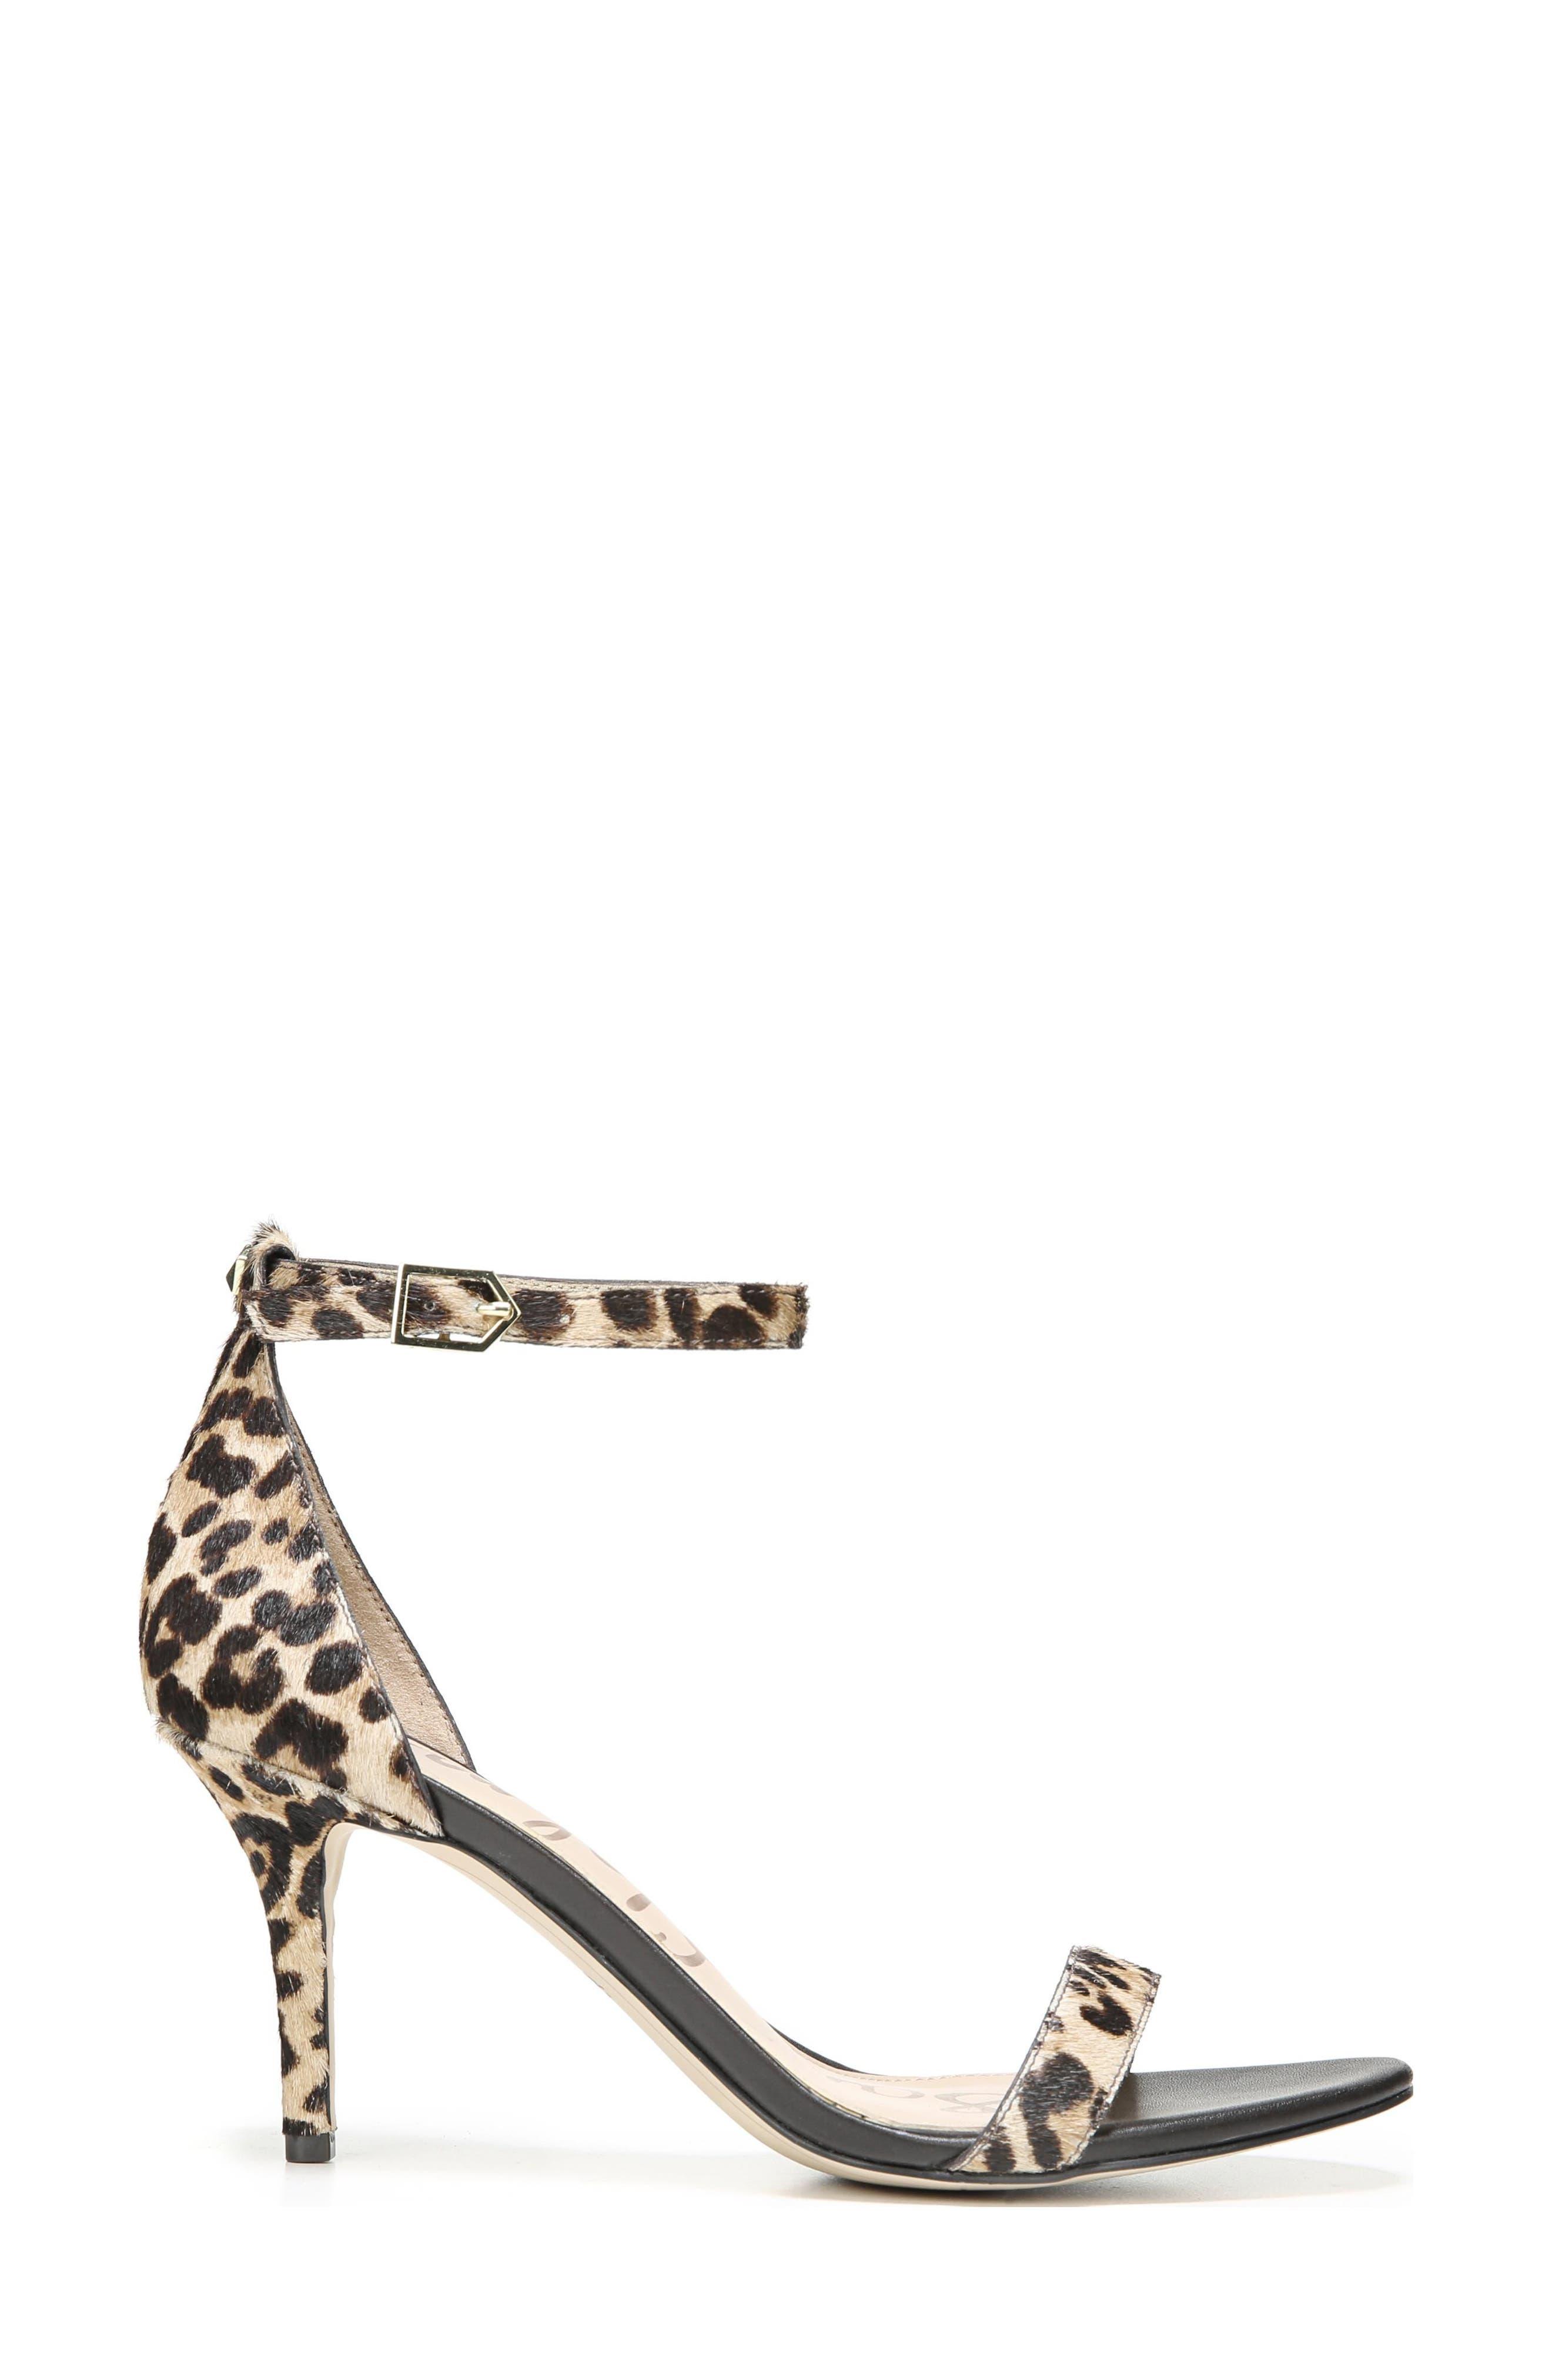 ,                             'Patti' Ankle Strap Sandal,                             Alternate thumbnail 64, color,                             200